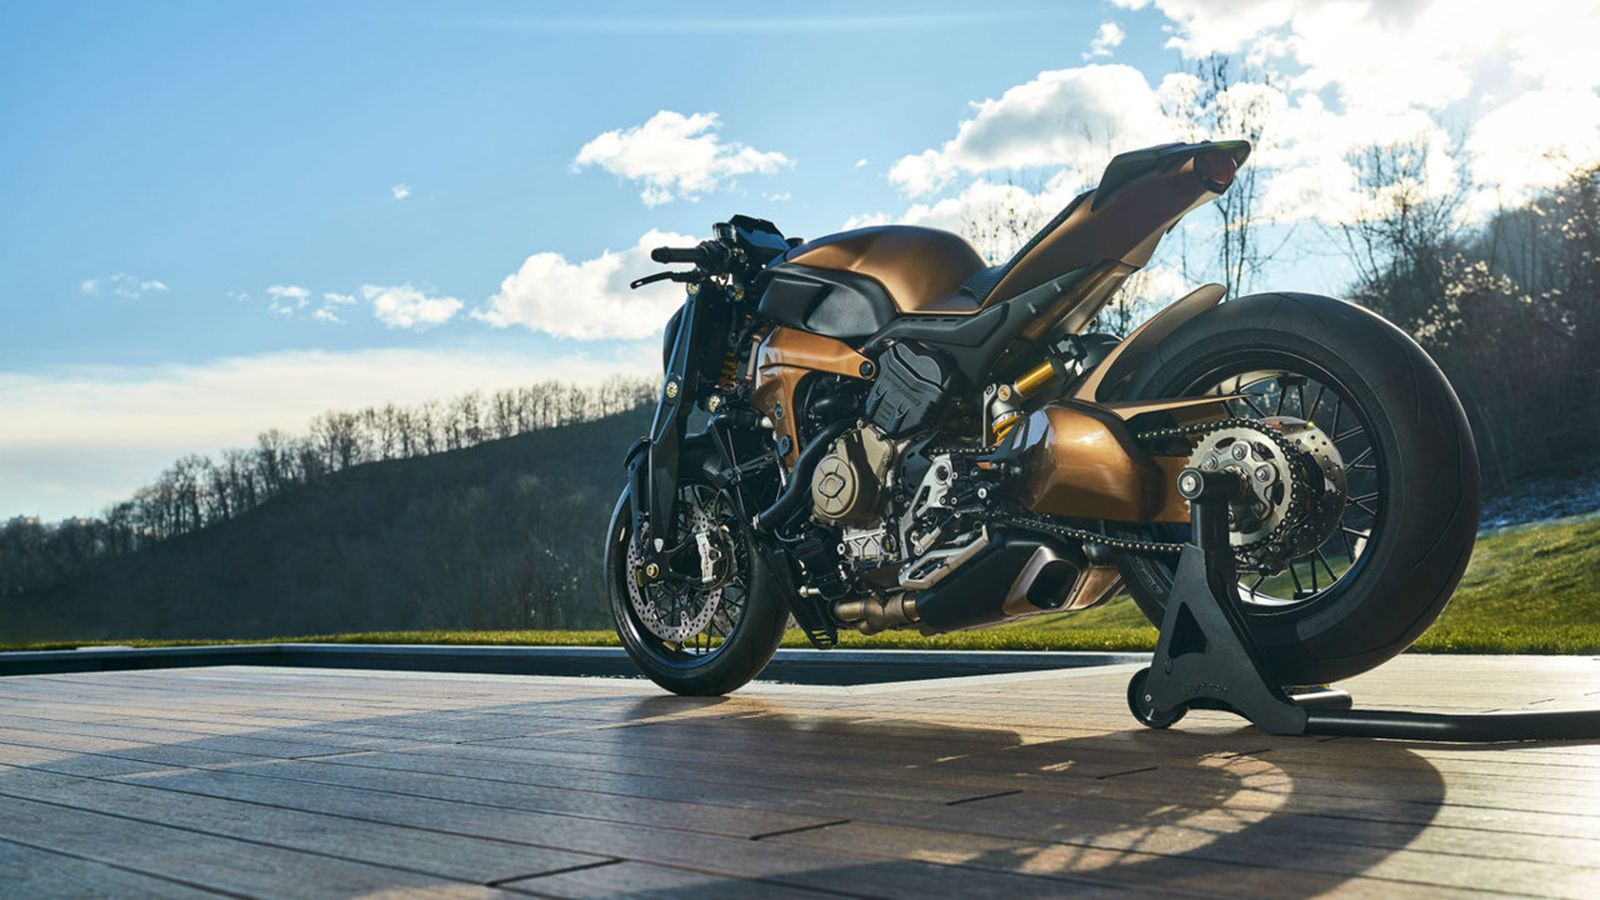 Custom-built Ducati V4 Penta To Fill The Void Of A Naked